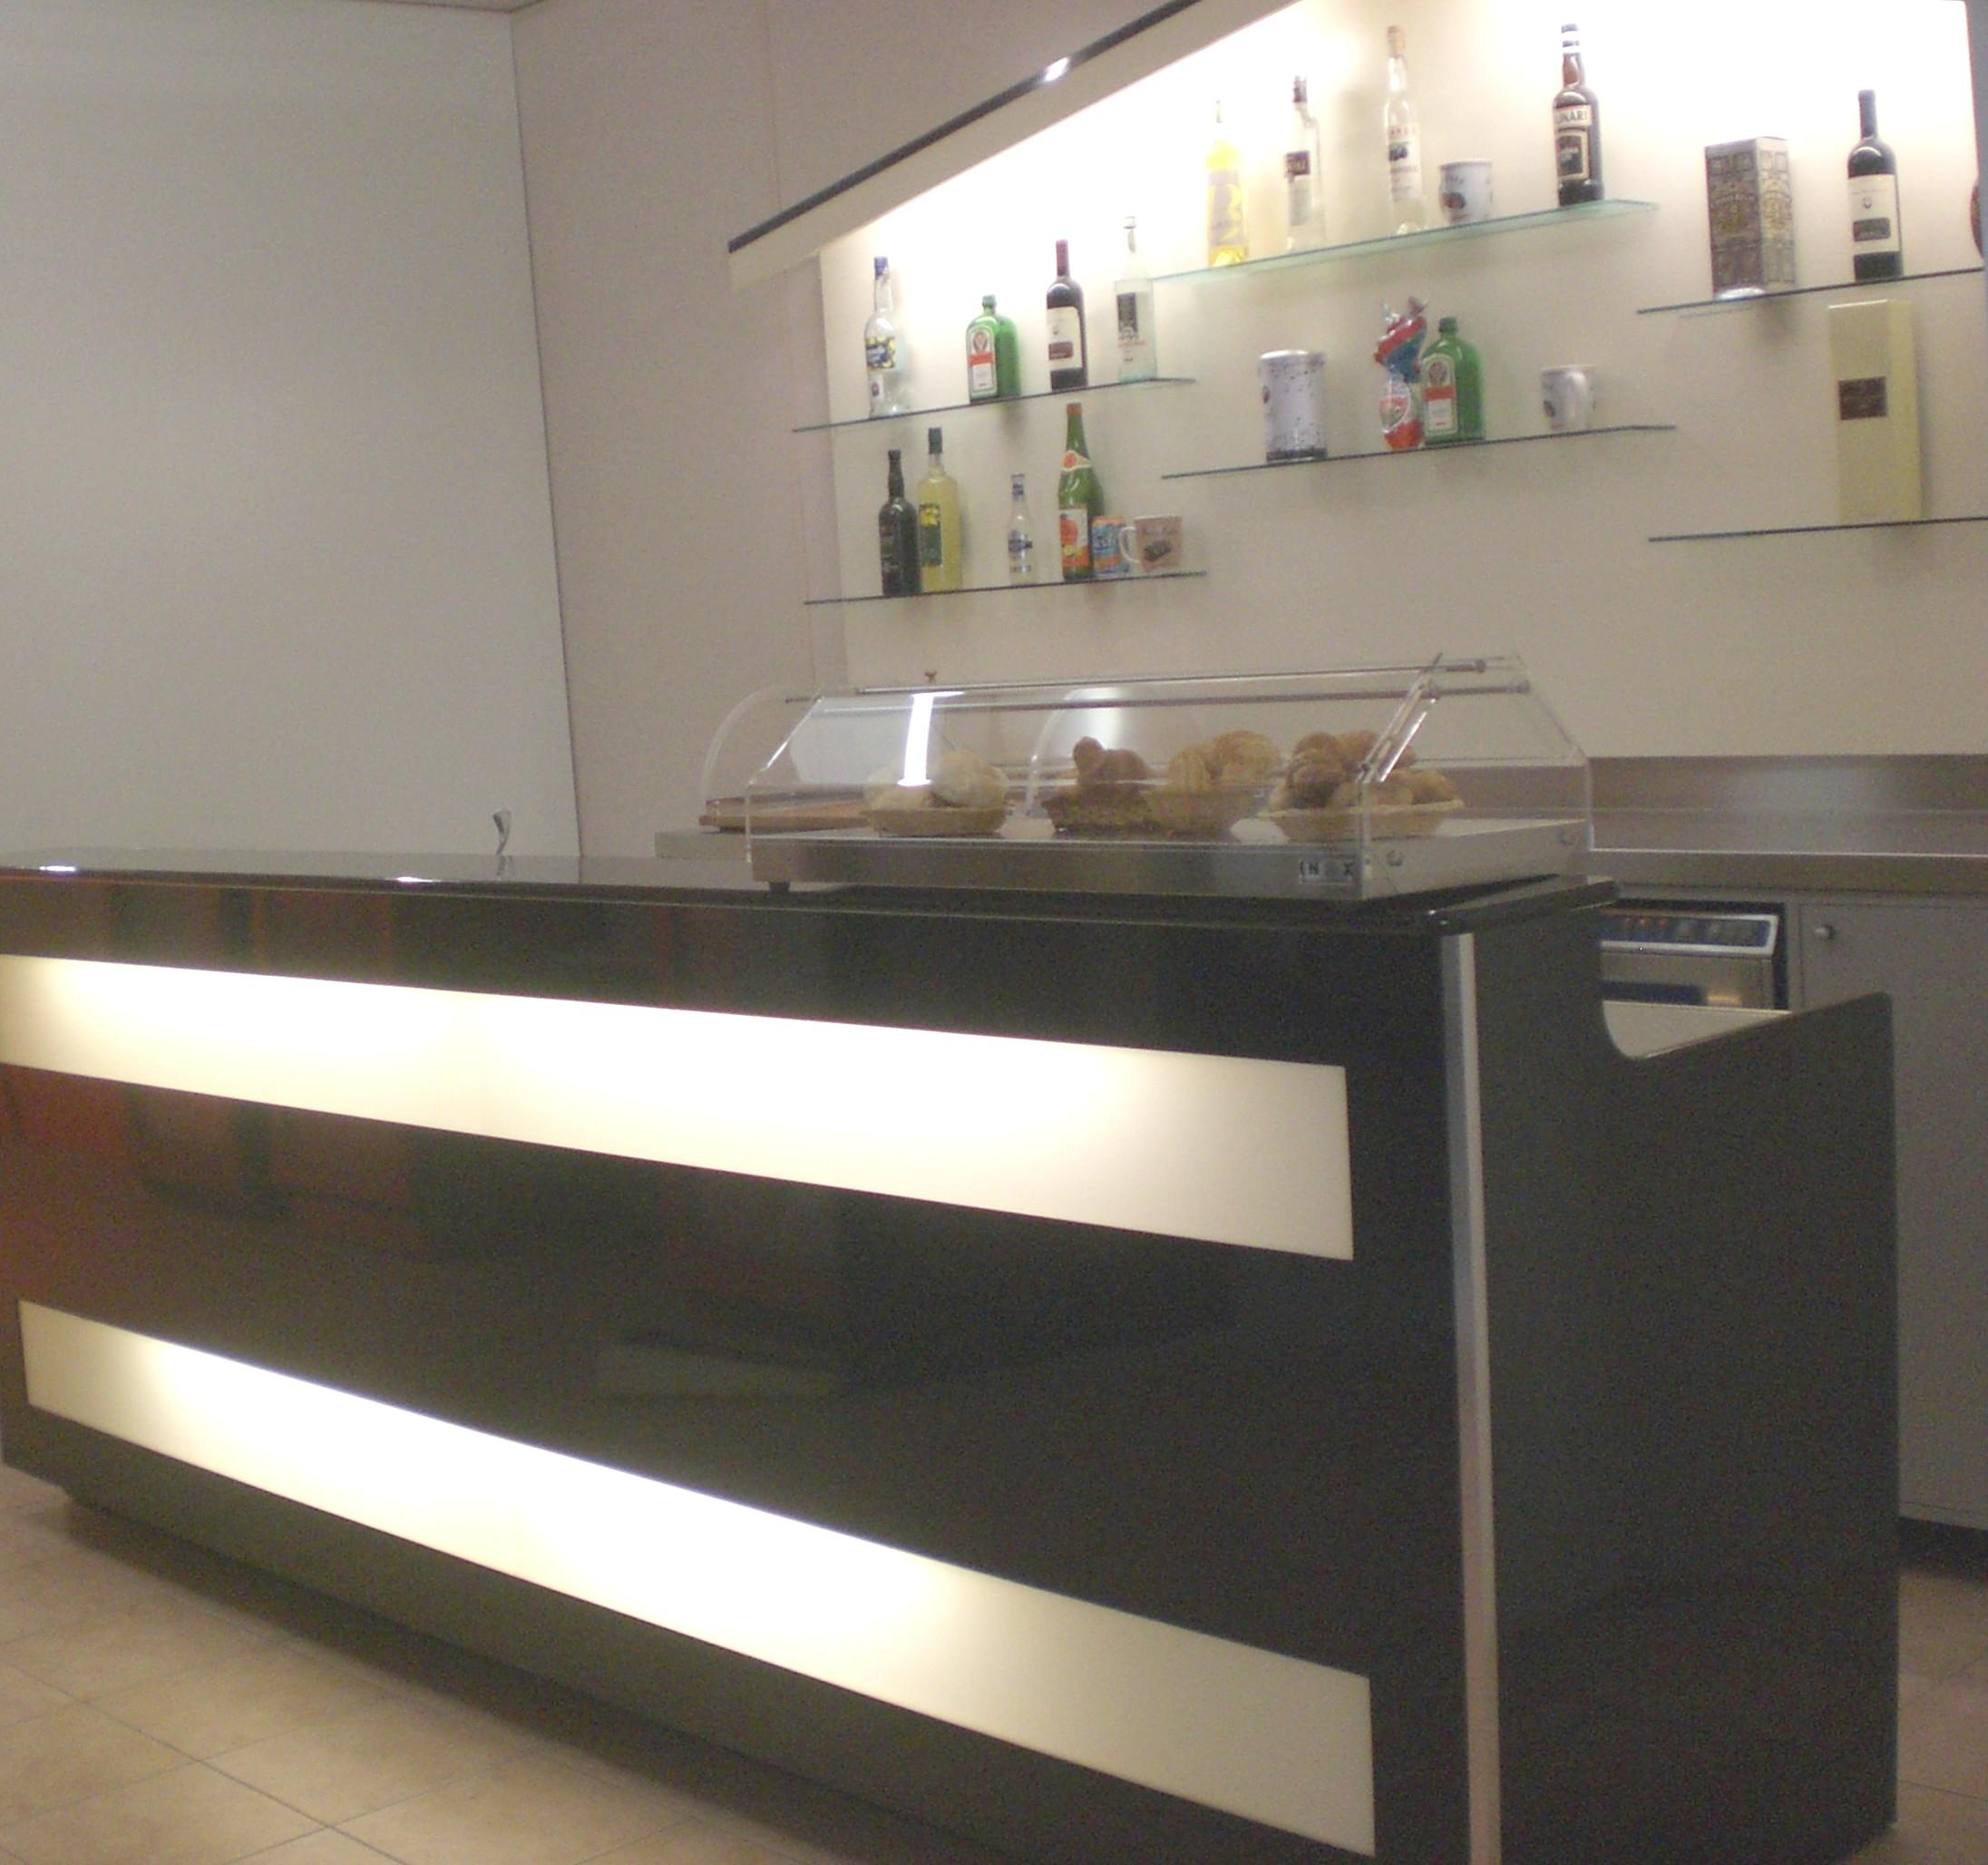 Banchi Bar, COMPRA IN FABBRICA, Banconi Bar, Banconi Frigo ...